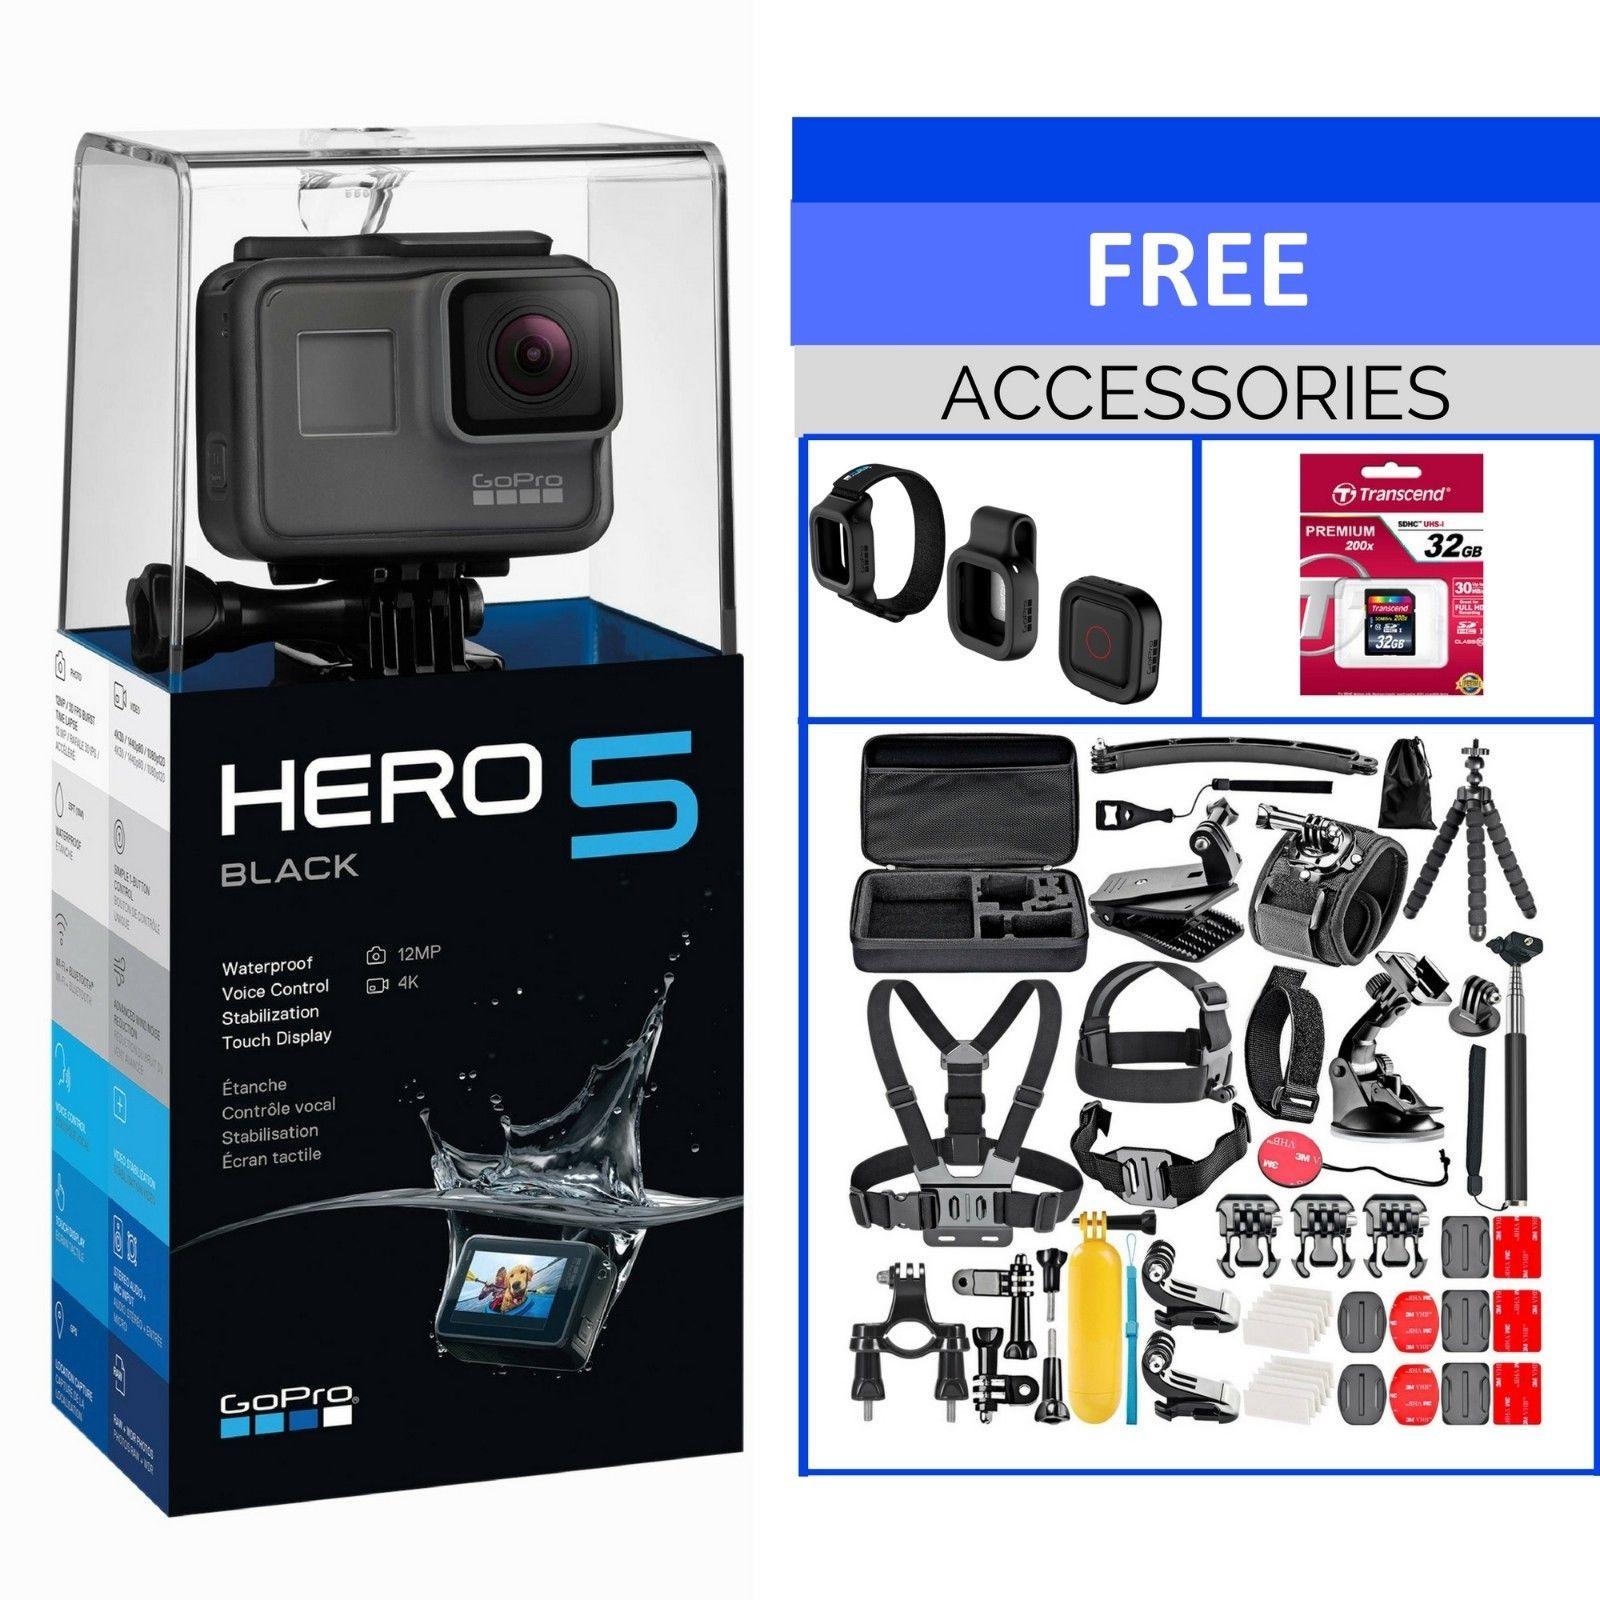 GoPro HERO 5 Black Movement Electrical digicam – 4K 12MP – Water-proof – WIFI + Remote + BUNDLE